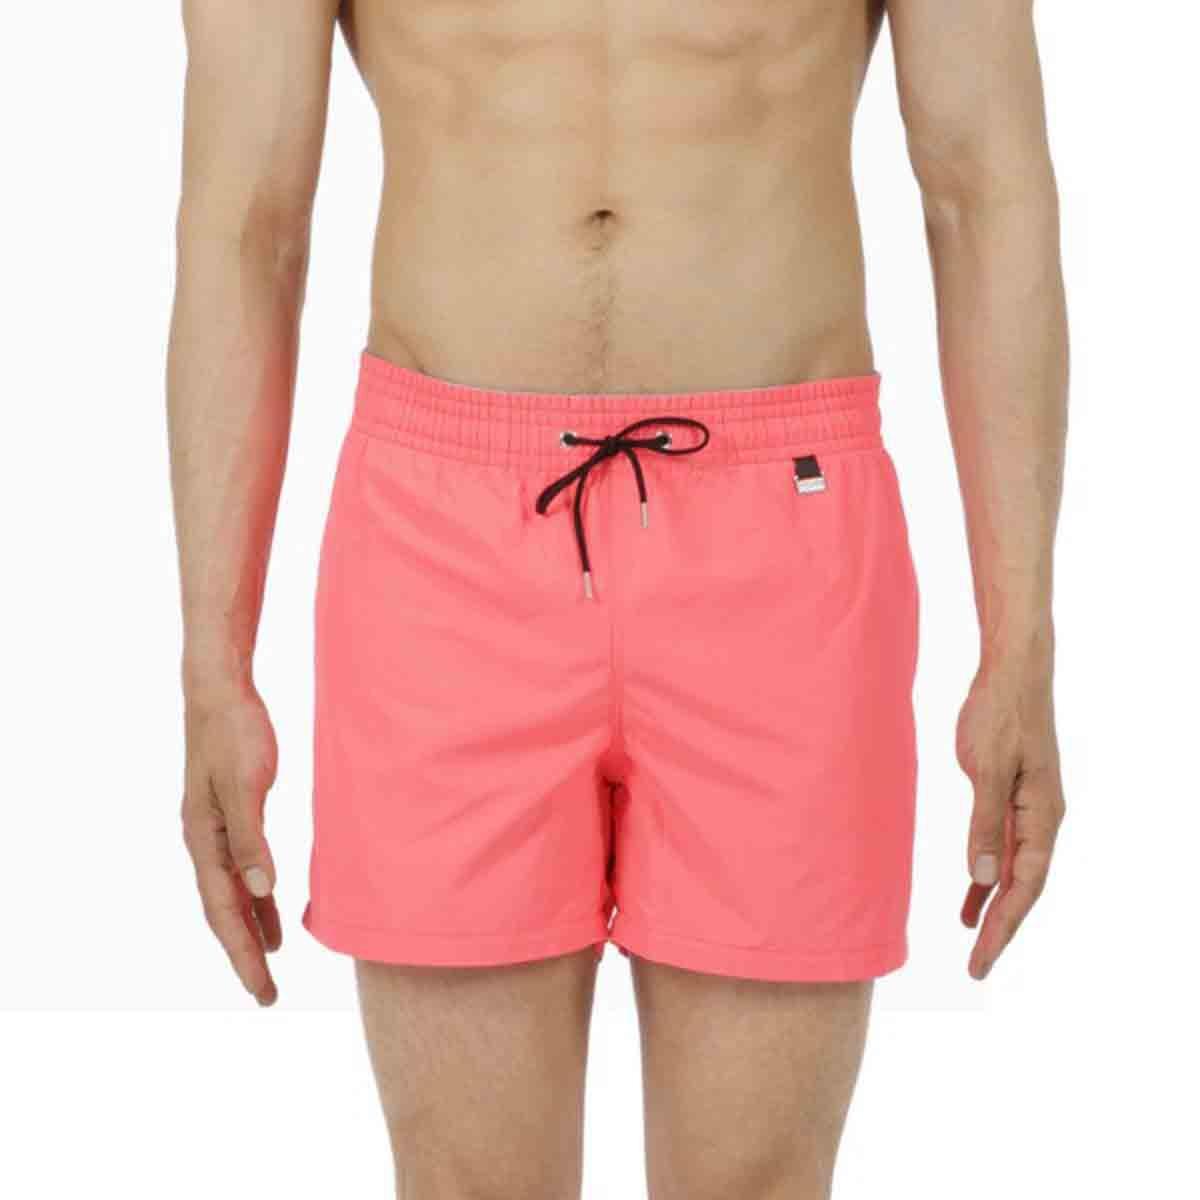 HOM Herren Badeshorts Splash pink